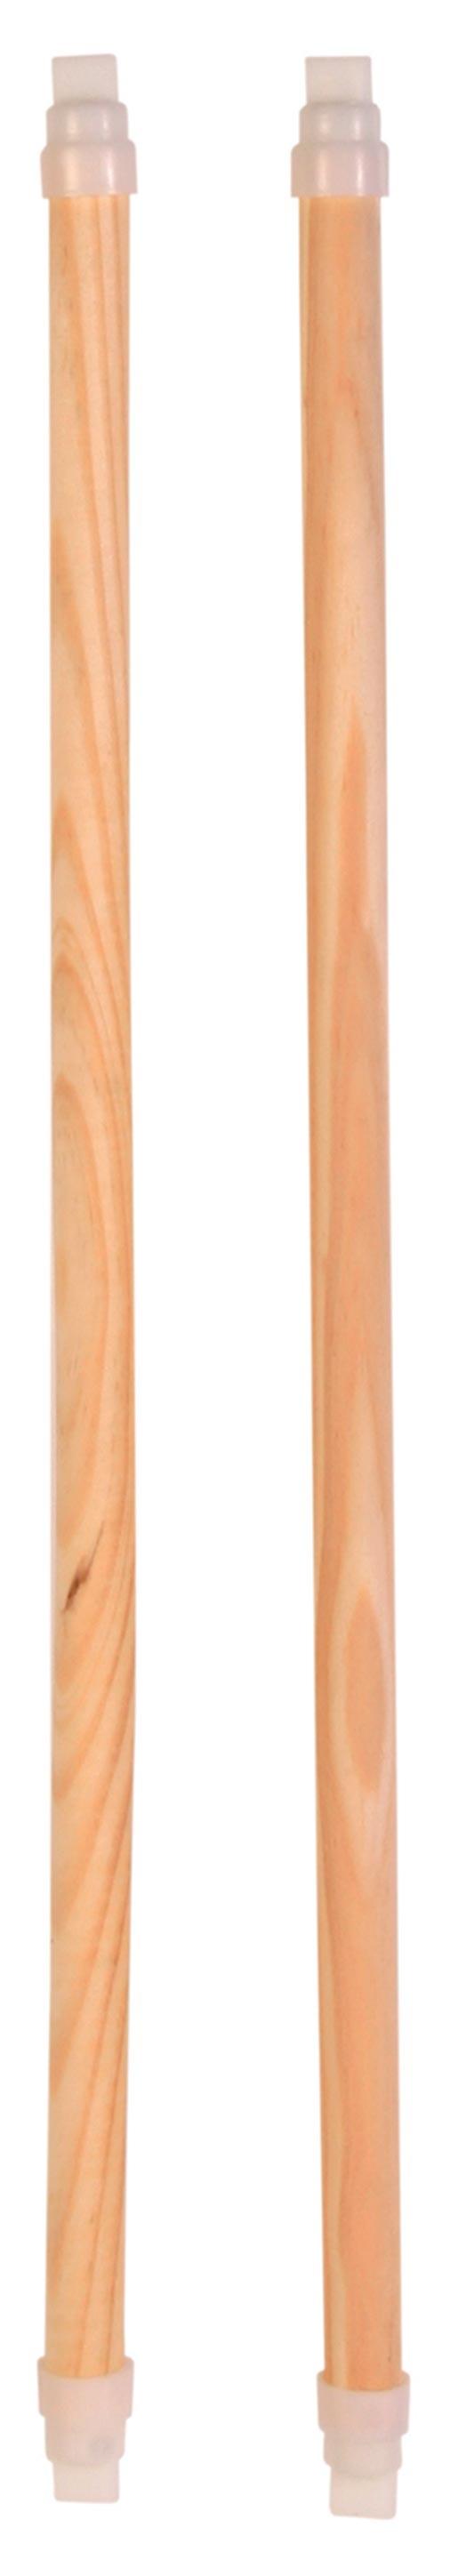 Bidýlko dřevěné Trixie 4ks 35cm*12mm